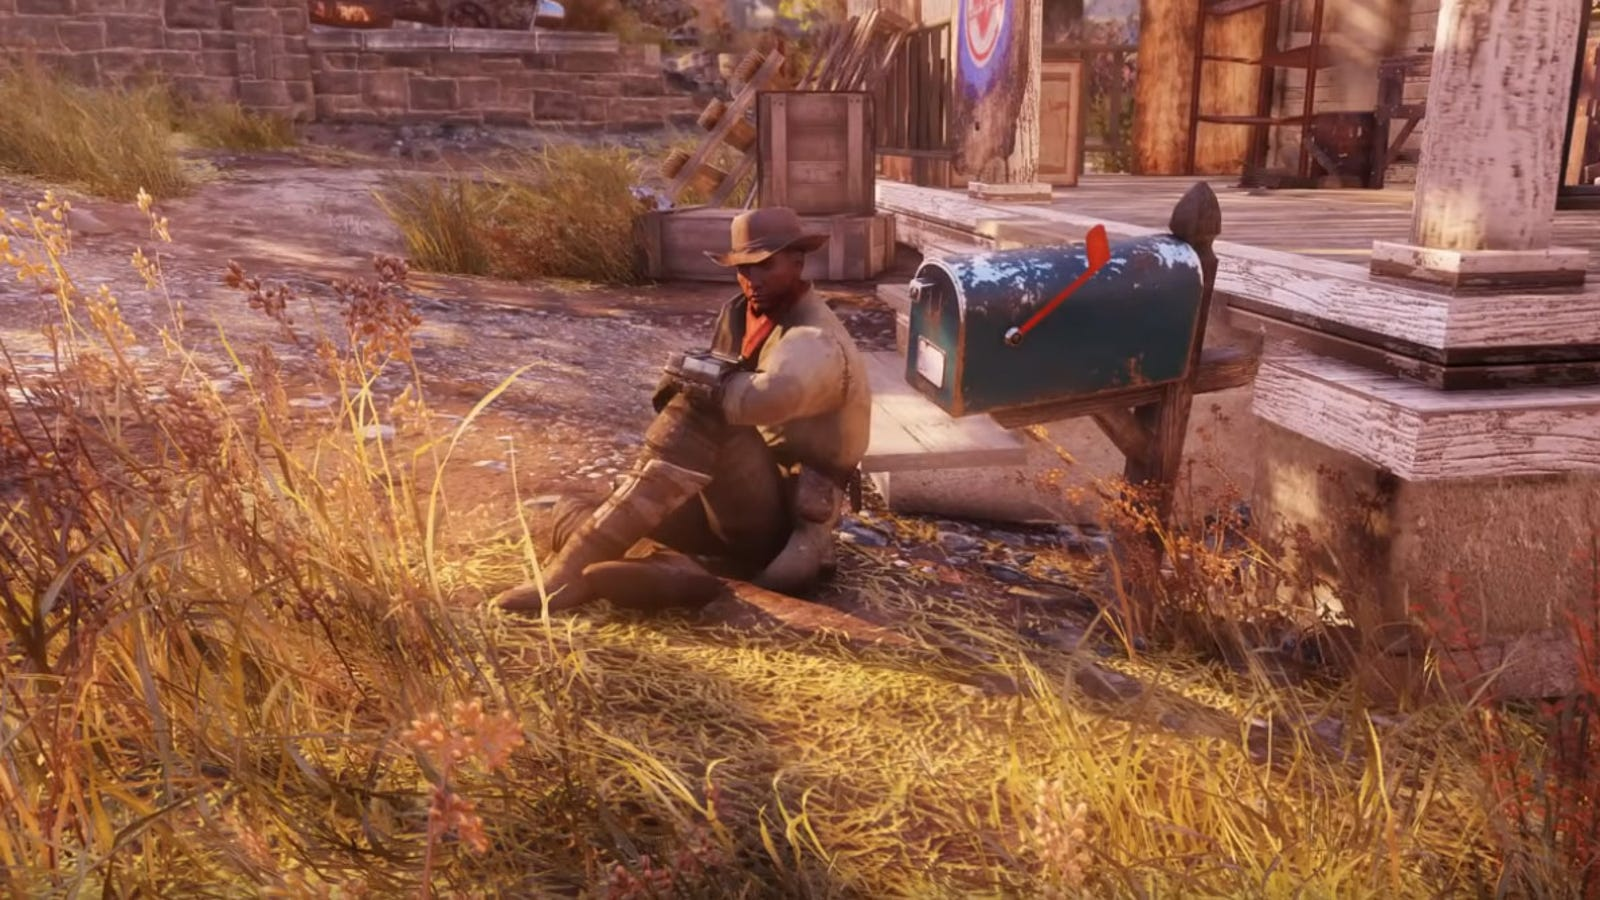 Guy Is Role-Playing As Preston Garvey In Fallout 76 - Kotaku